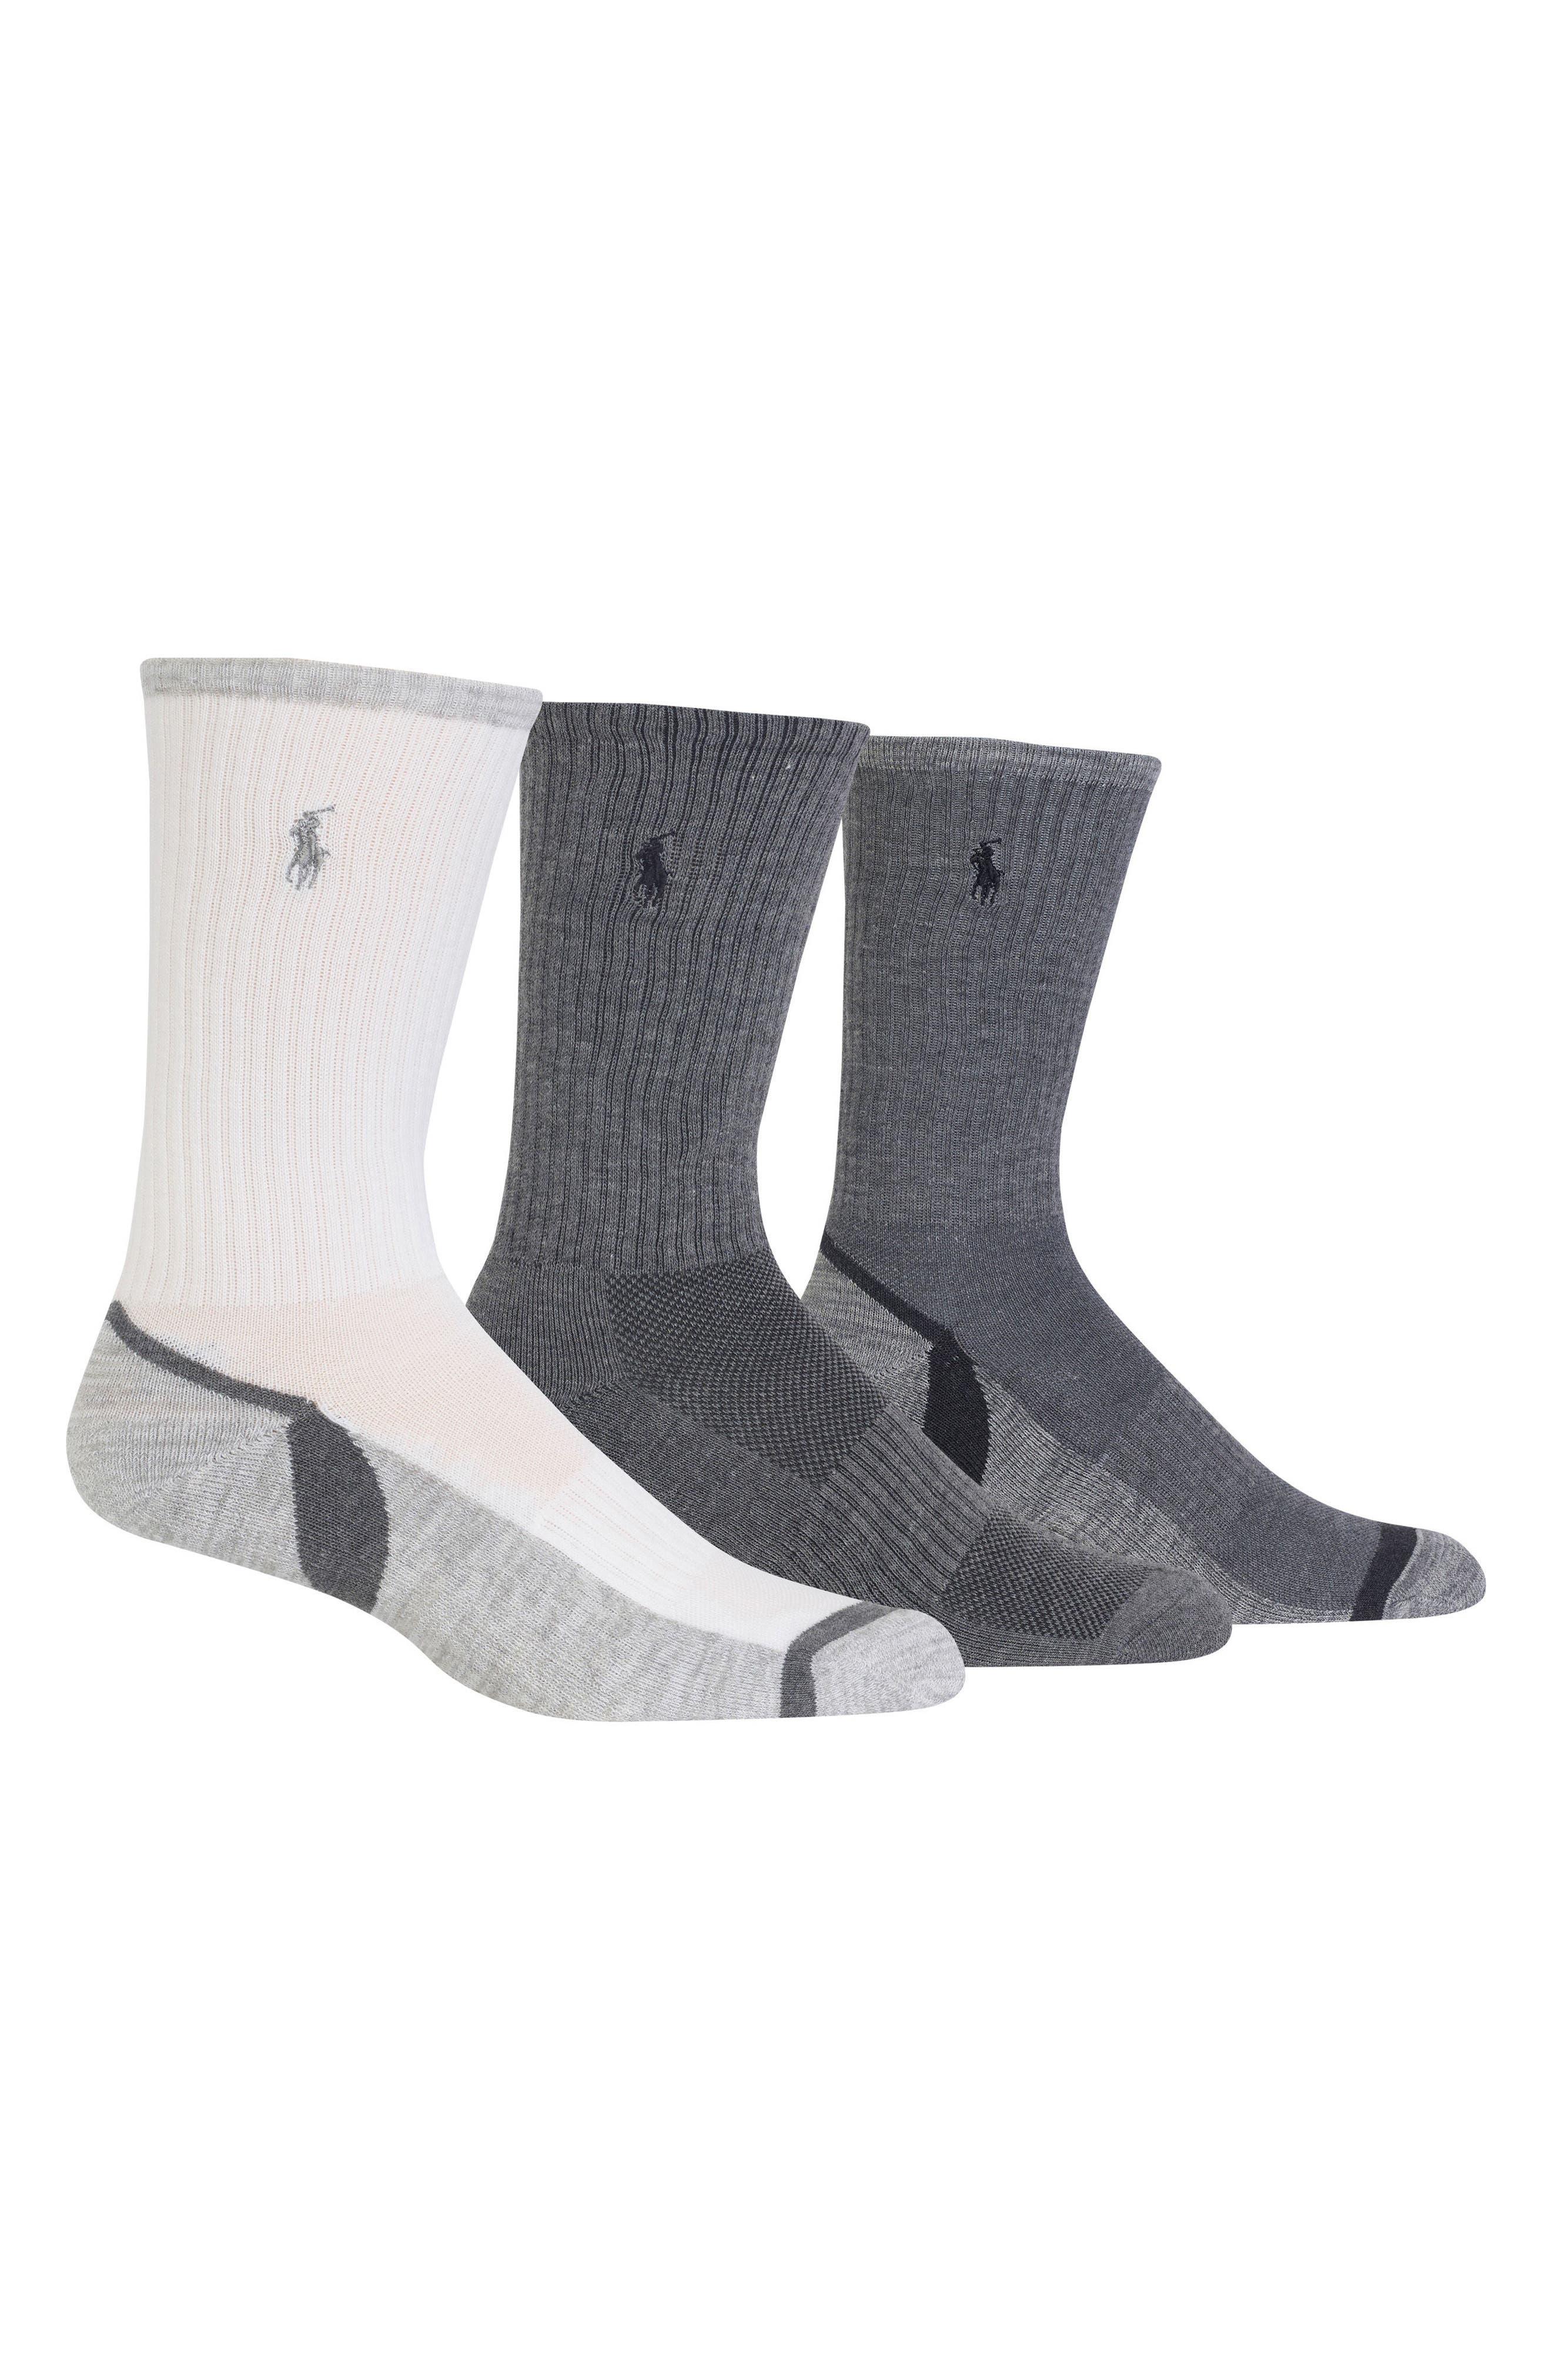 3-Pack Athletic Socks,                         Main,                         color, 020